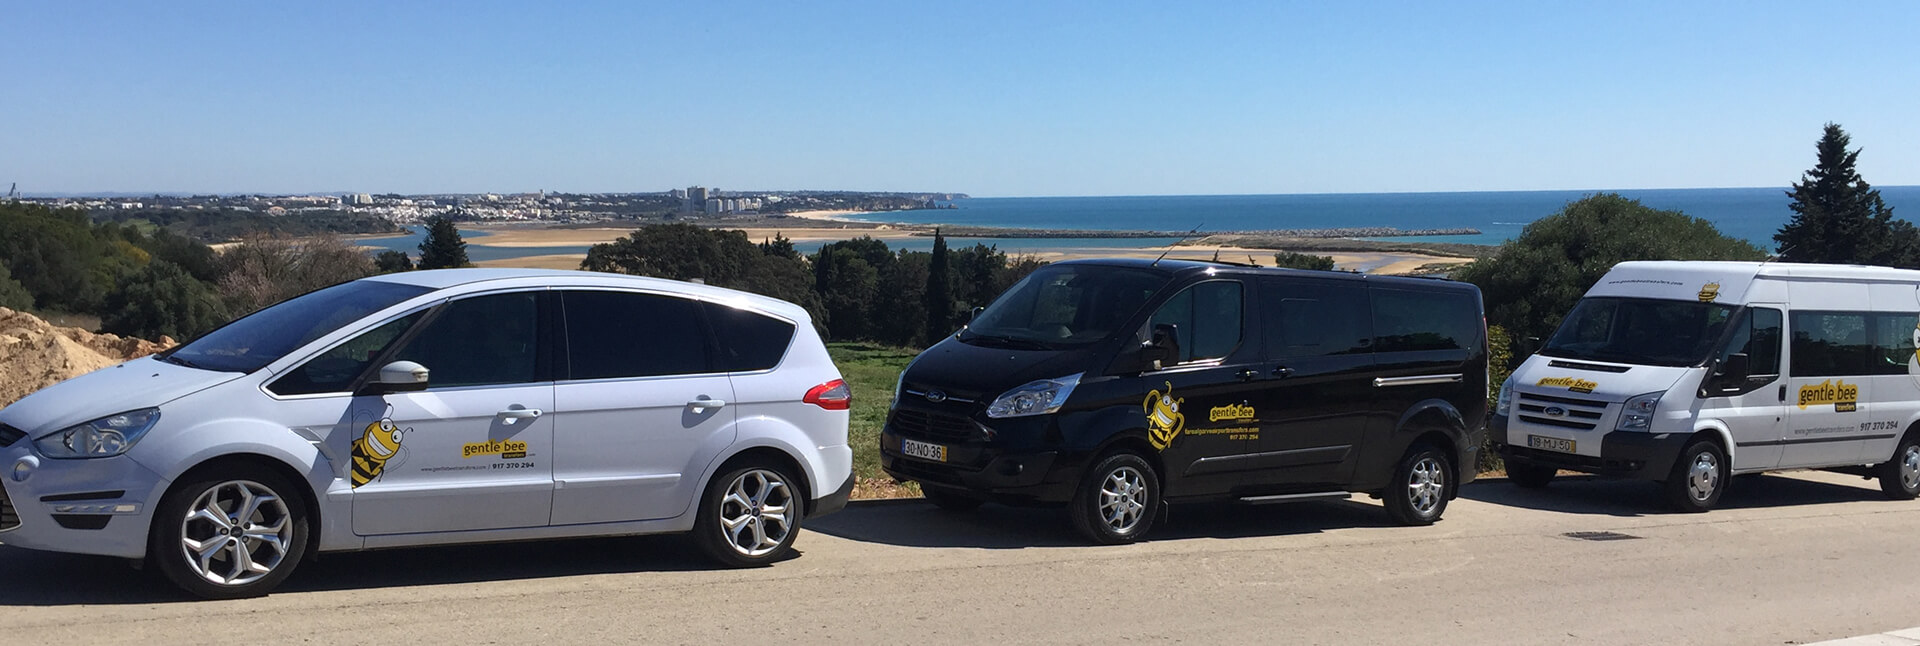 Algarve Transfers, Faro Airport - Gentle Bee